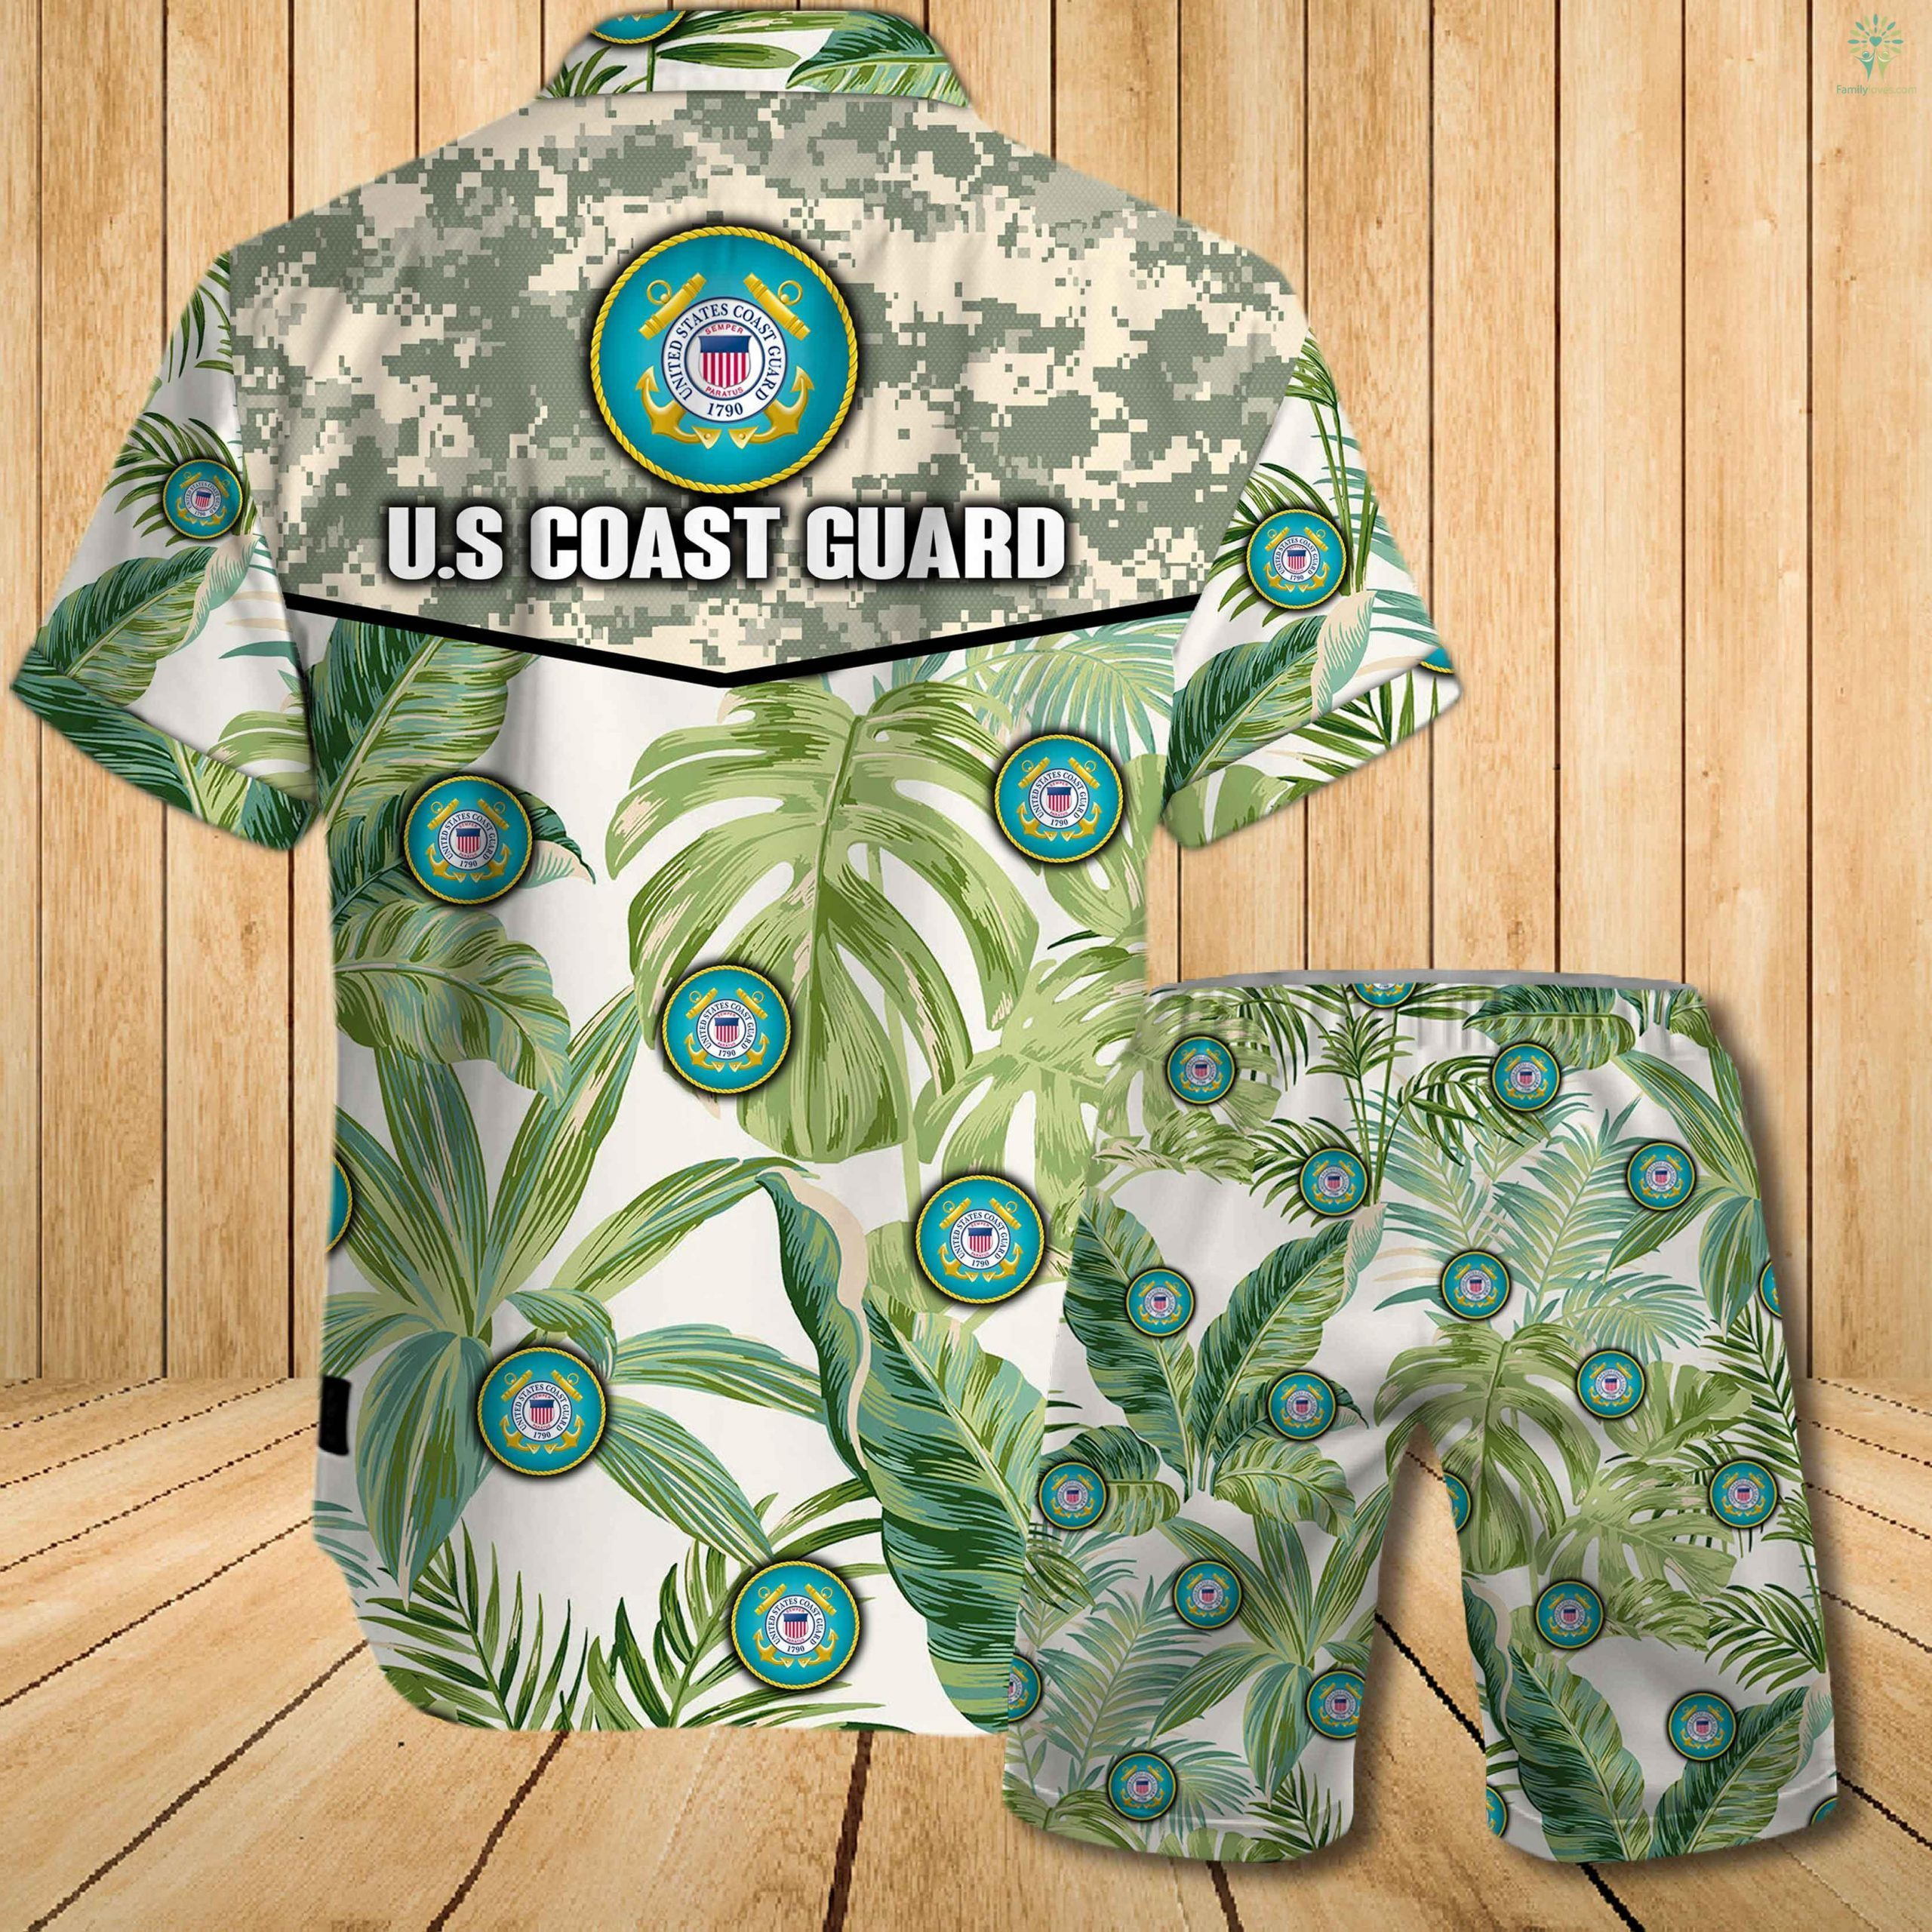 US coast guard all over printed hawaiian shirt 1